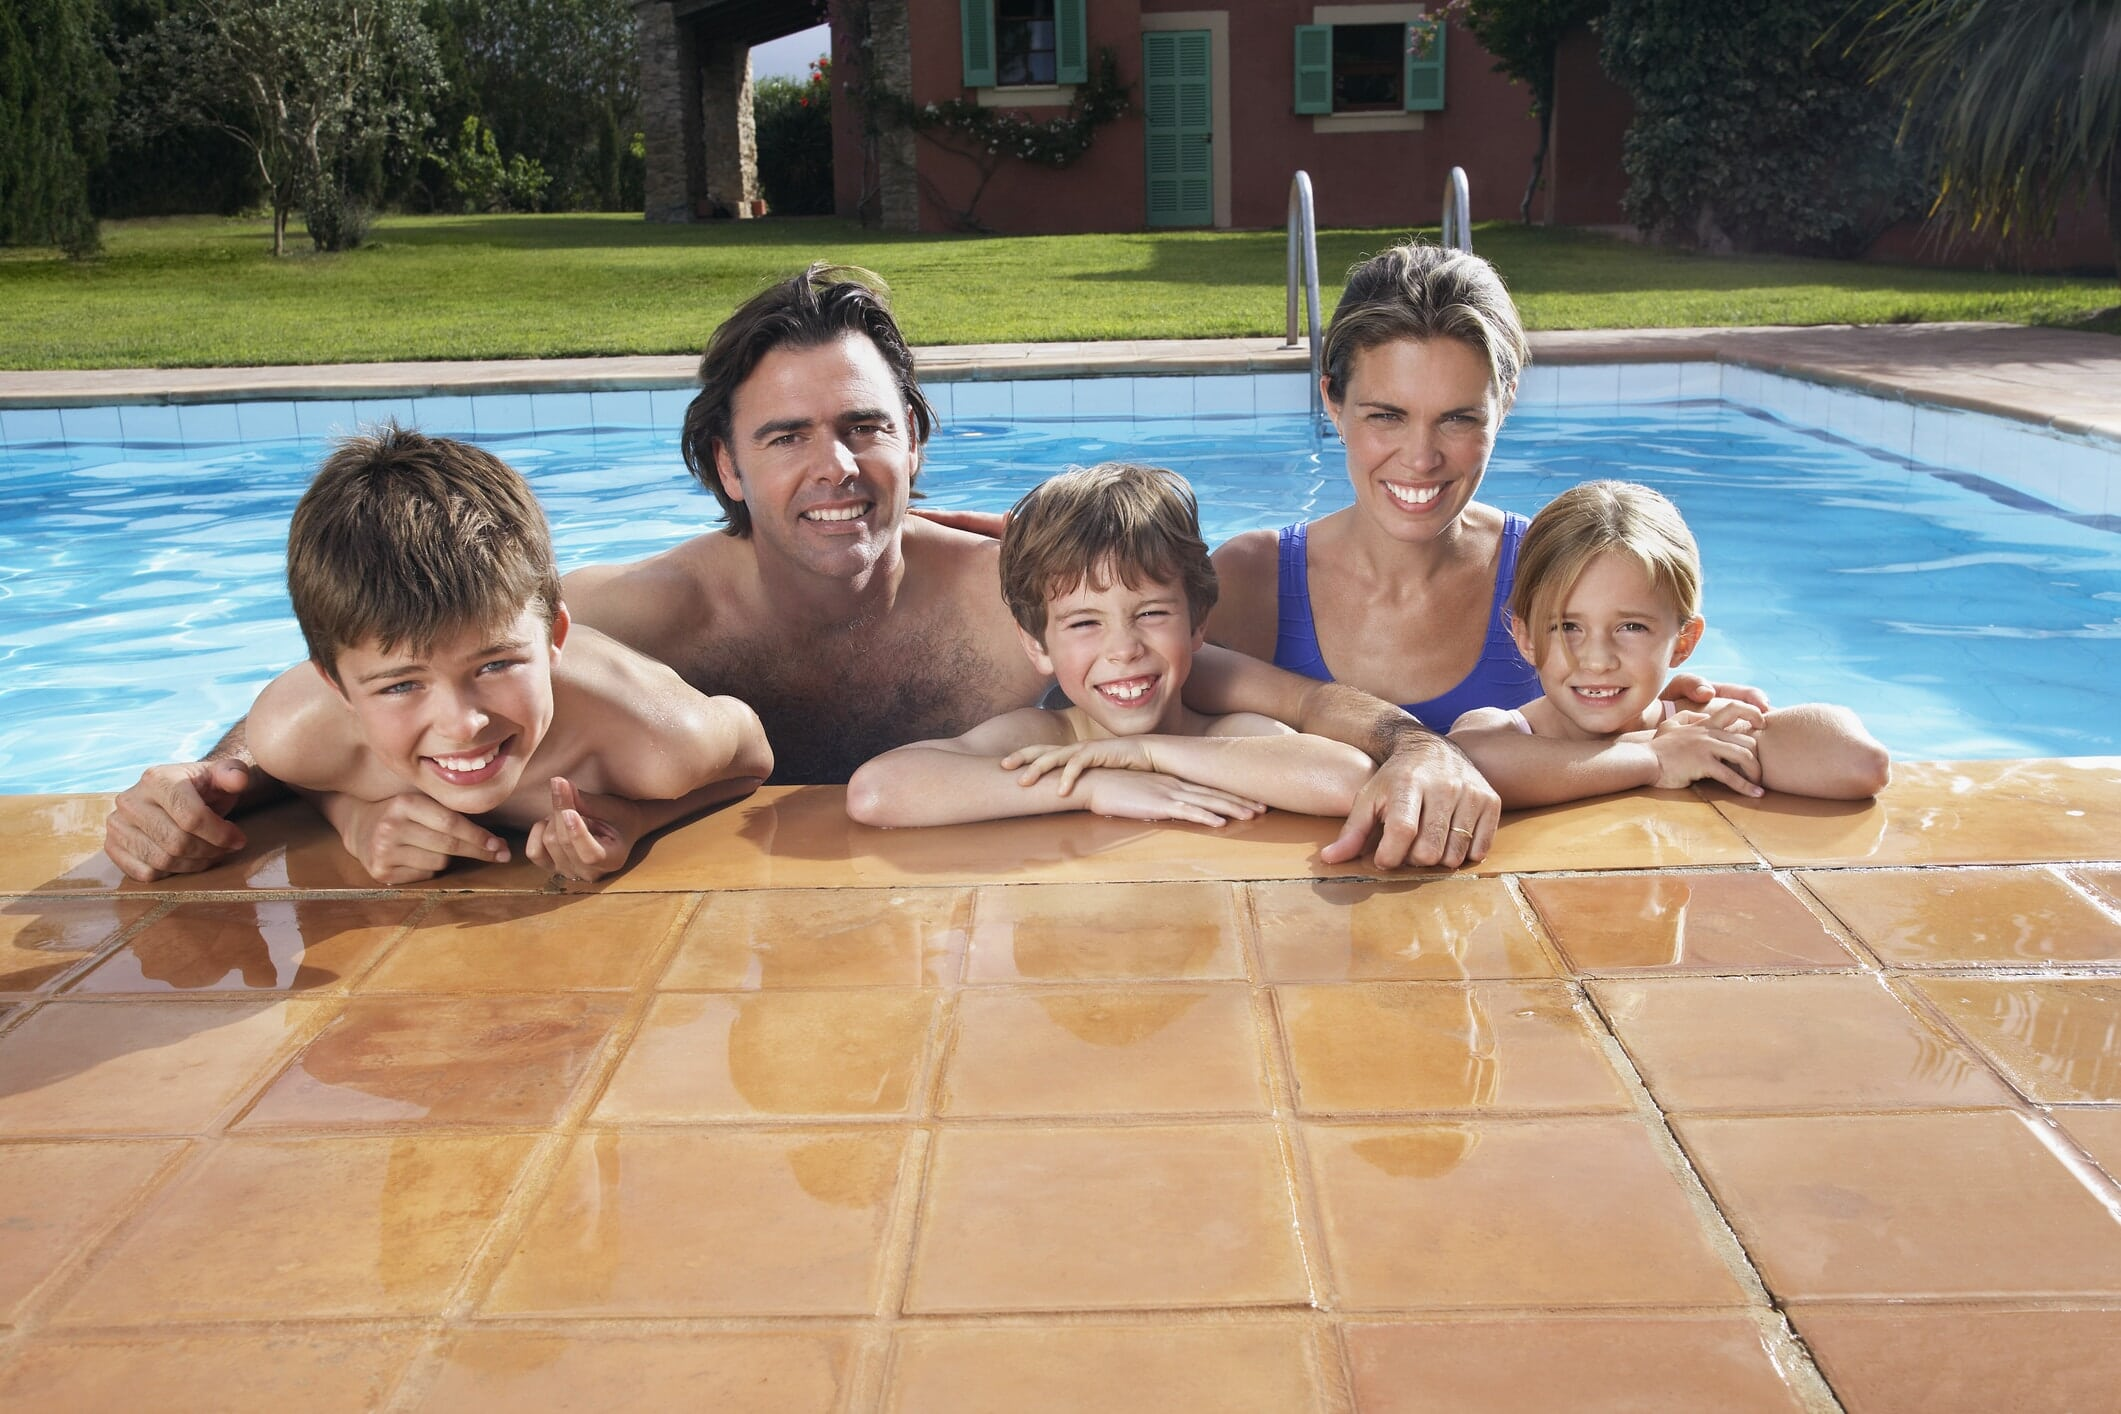 Paradise Pools and Spas of Illinois, Inc. image 3